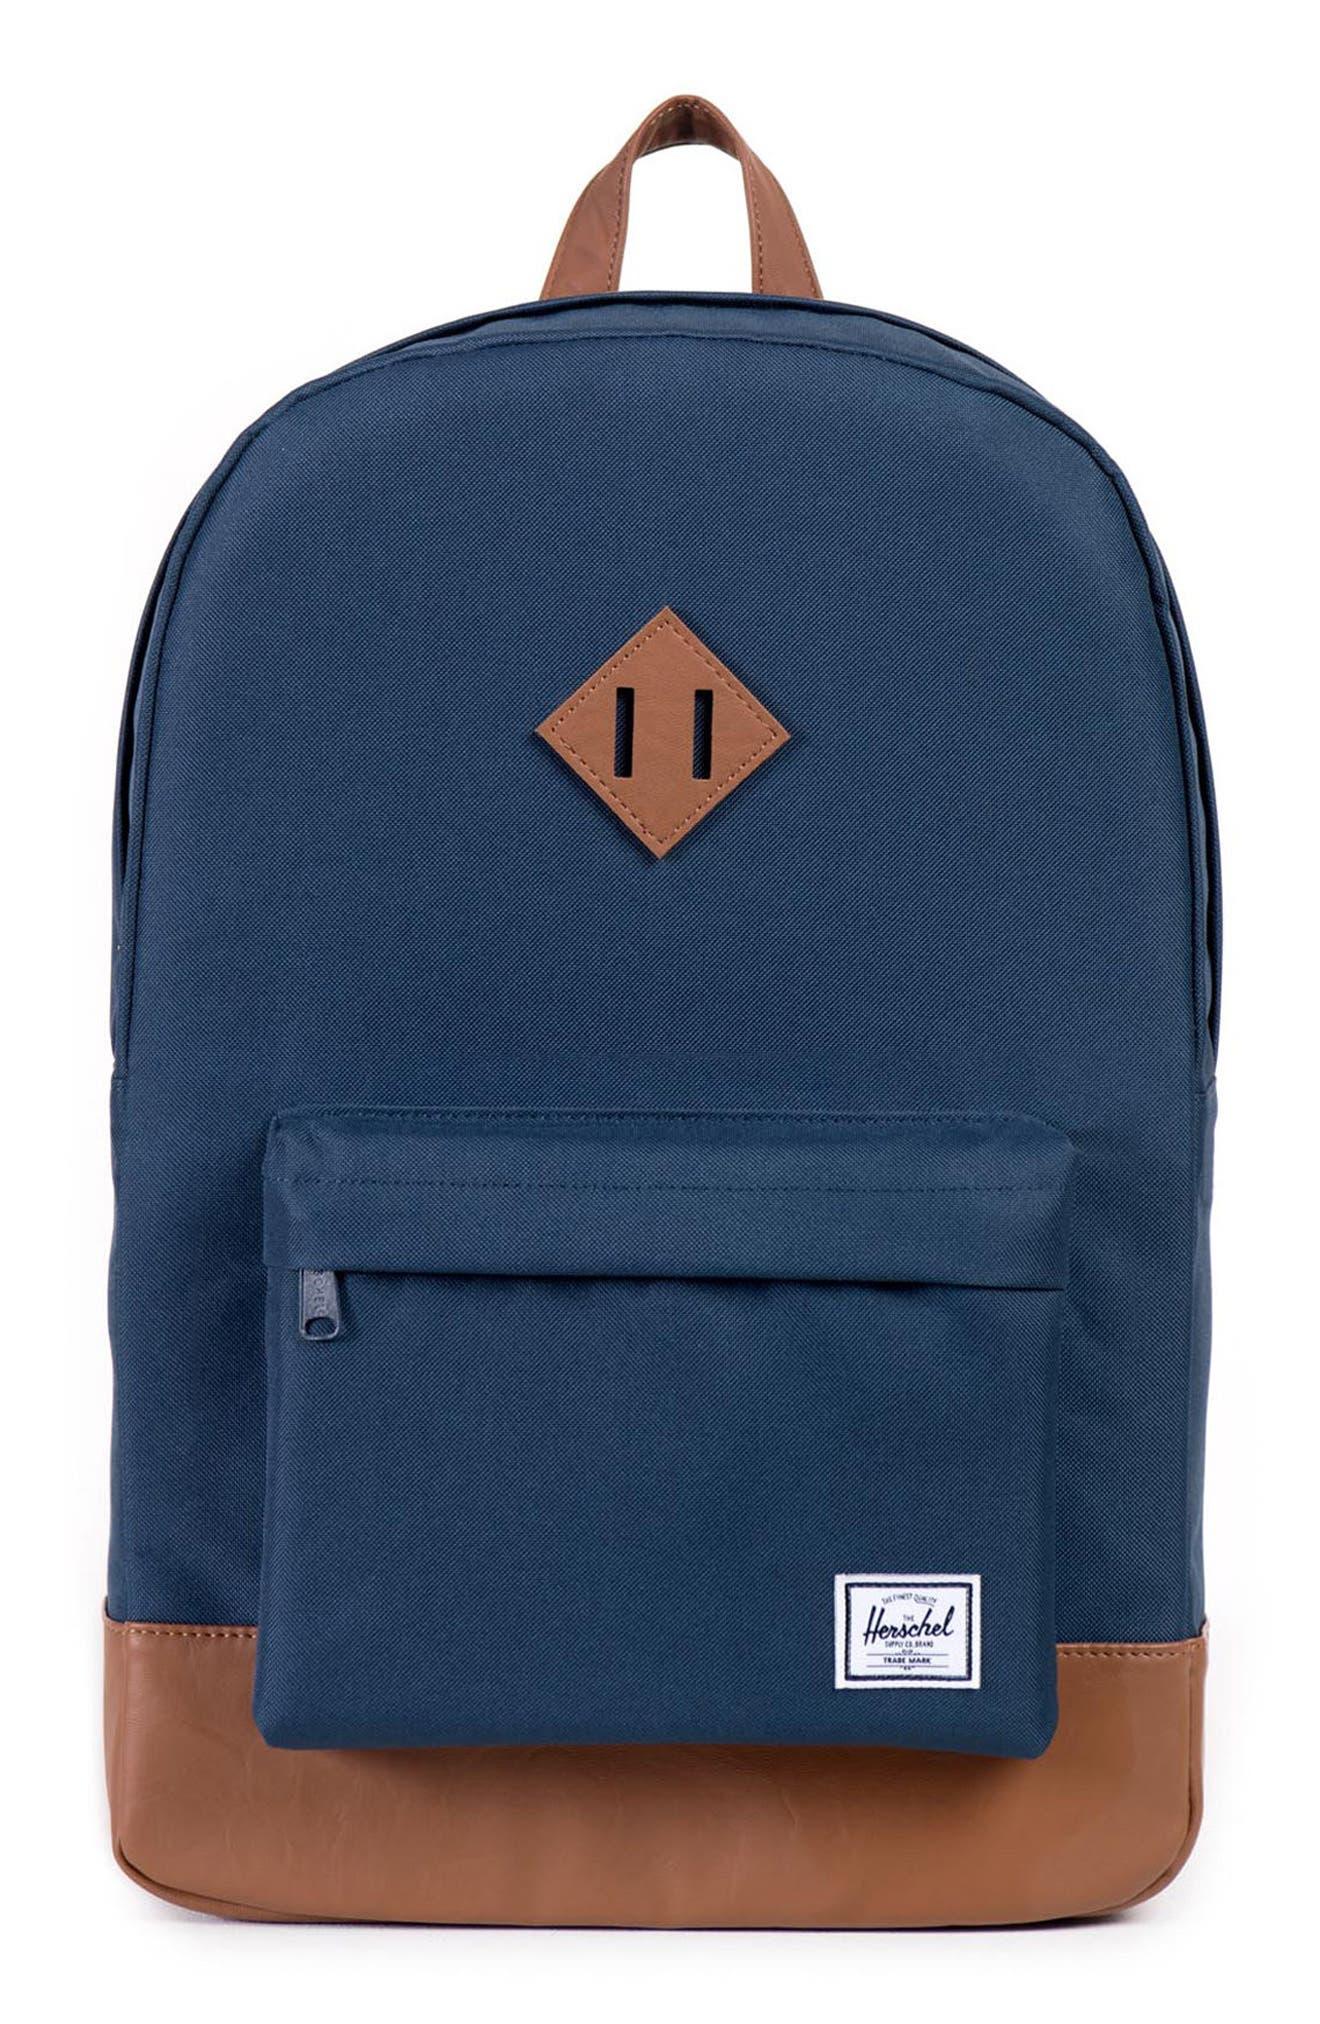 Alternate Image 1 Selected - Herschel Supply Co. Heritage Backpack